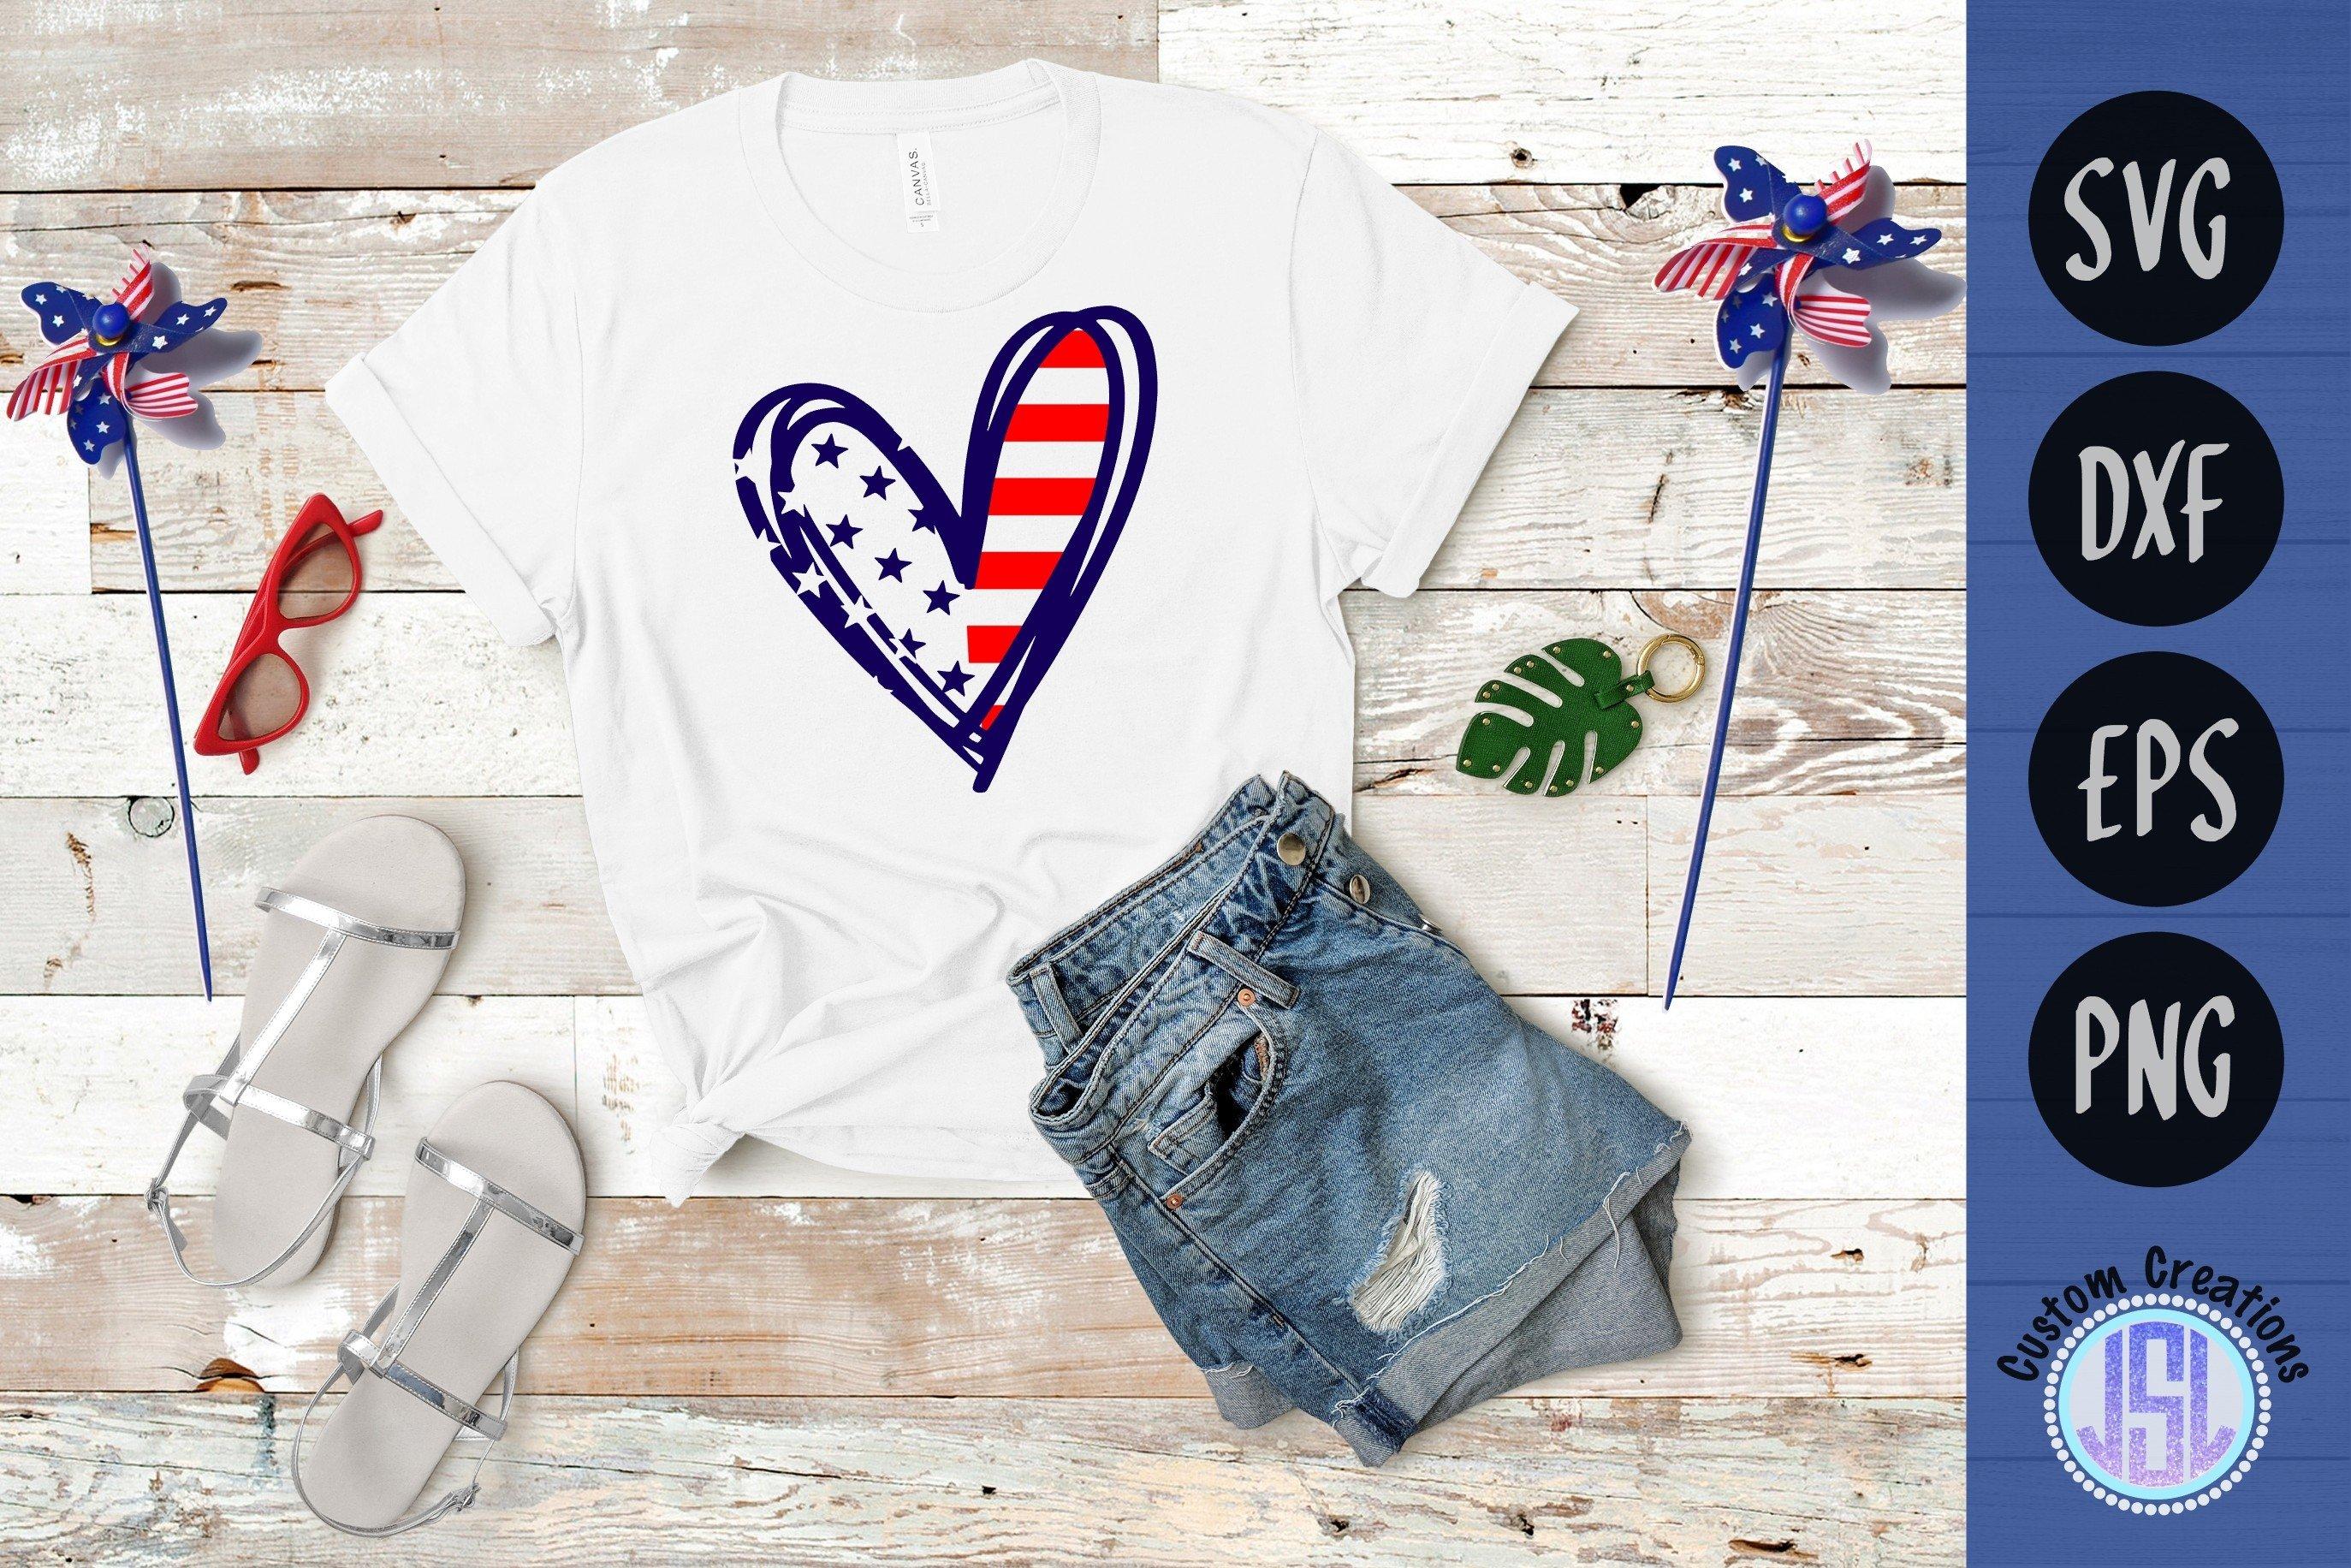 Patriotic Heart | Patriotic SVG Cut File | SVG DXF EPS PNG example image 1